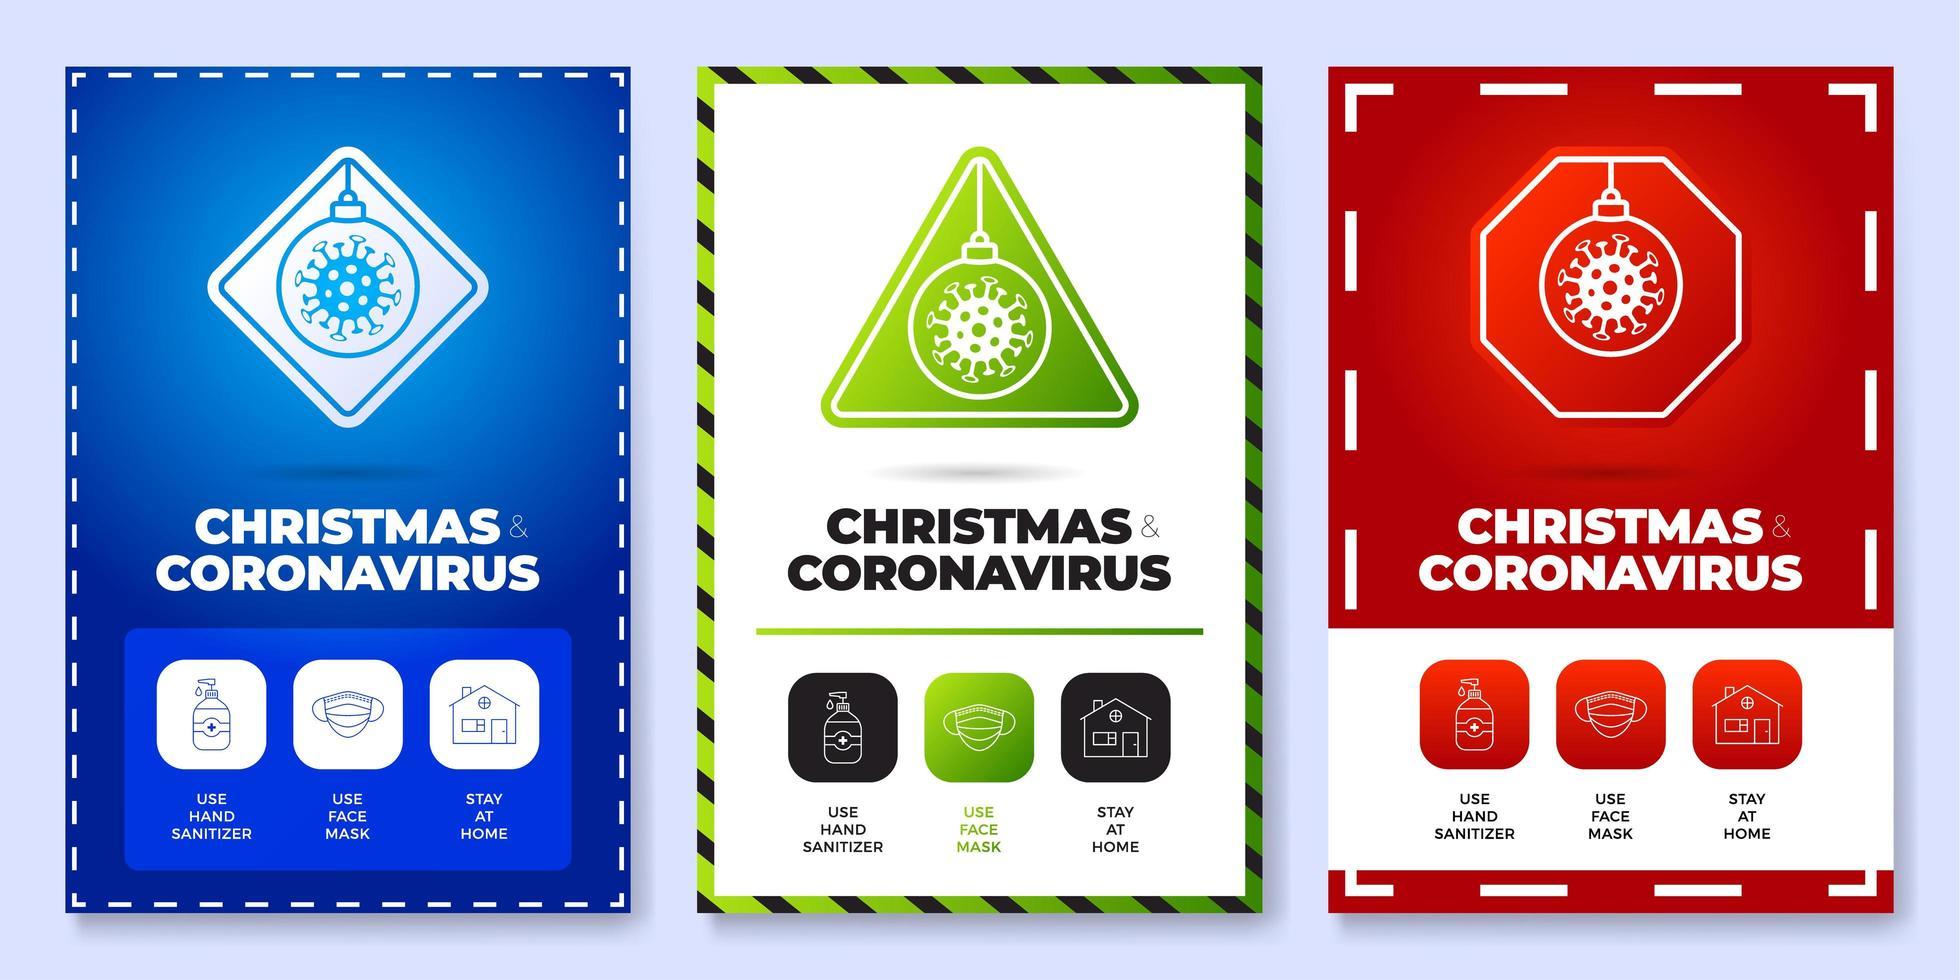 Christmas coronavirus all in one icon poster set vector